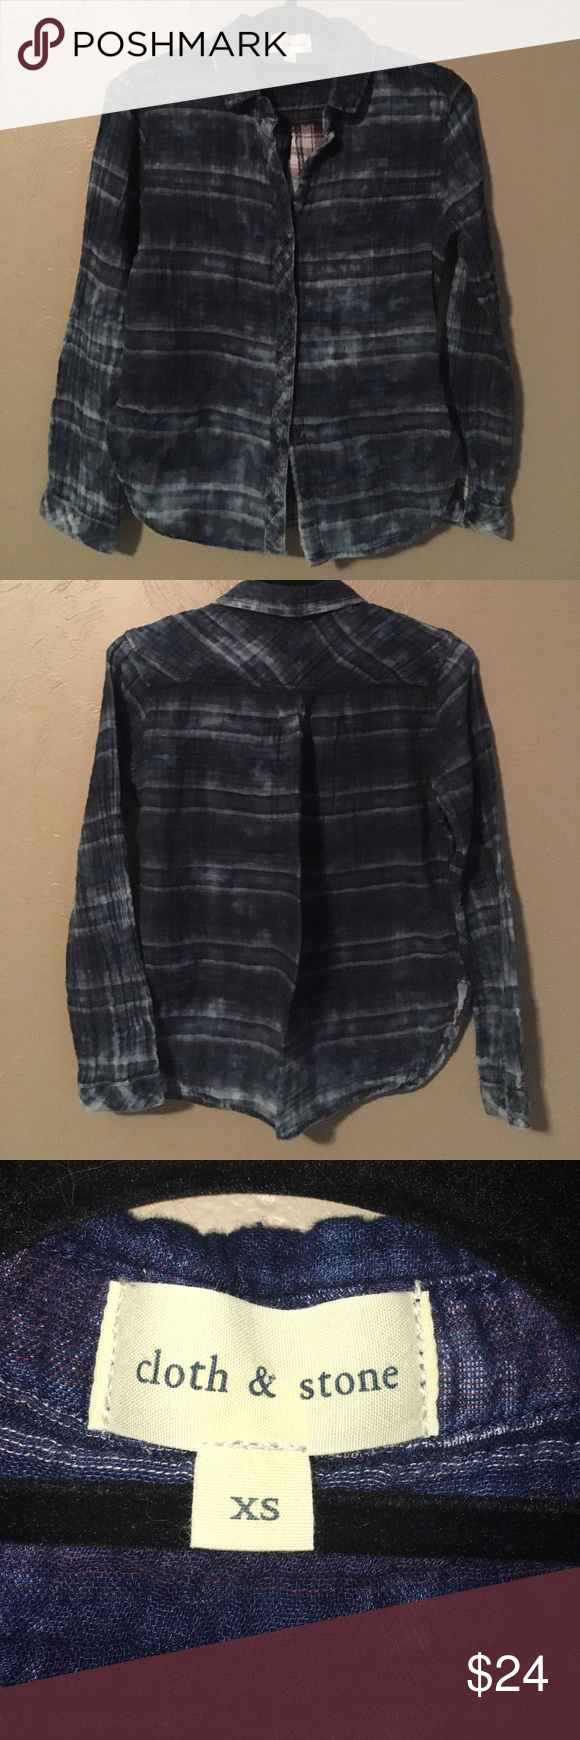 Flannel shirt xs  Anthropologie cloth u stone Flannel Shirt  Flannel shirts Flannels